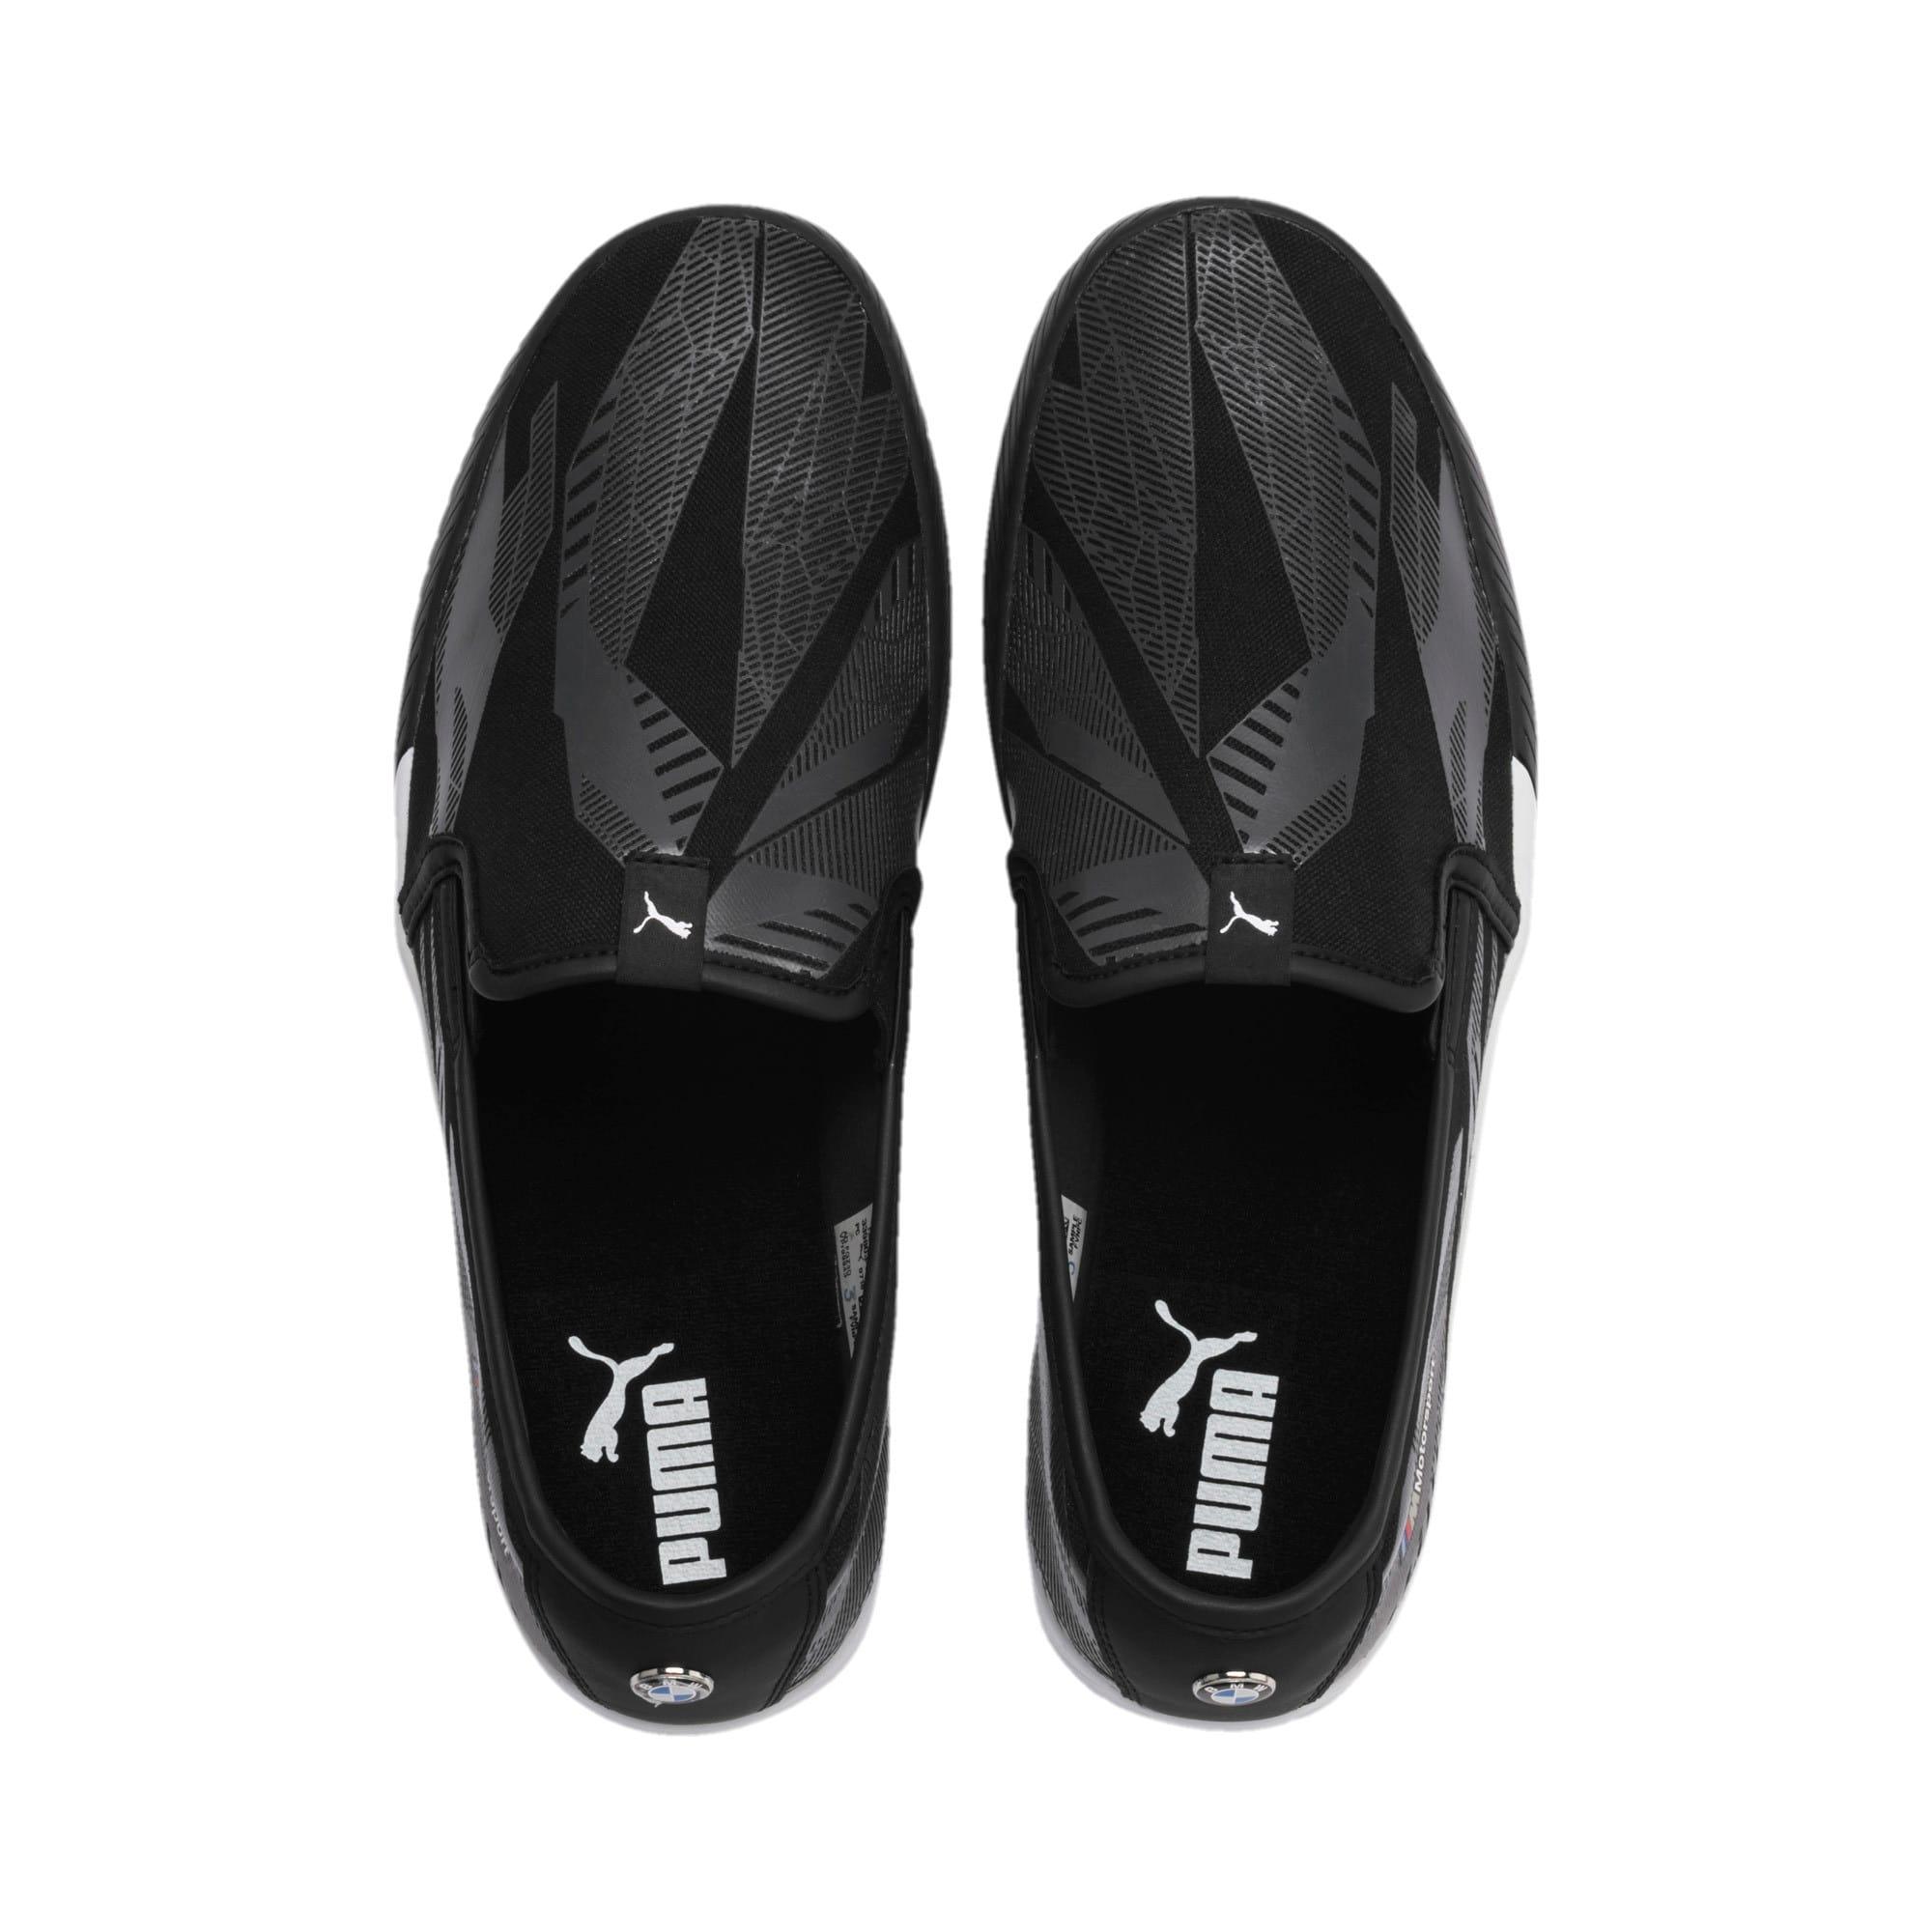 Thumbnail 7 of BMW M Motorsport Slip-On Gradient Track Shoes, Puma Black-Puma Black, medium